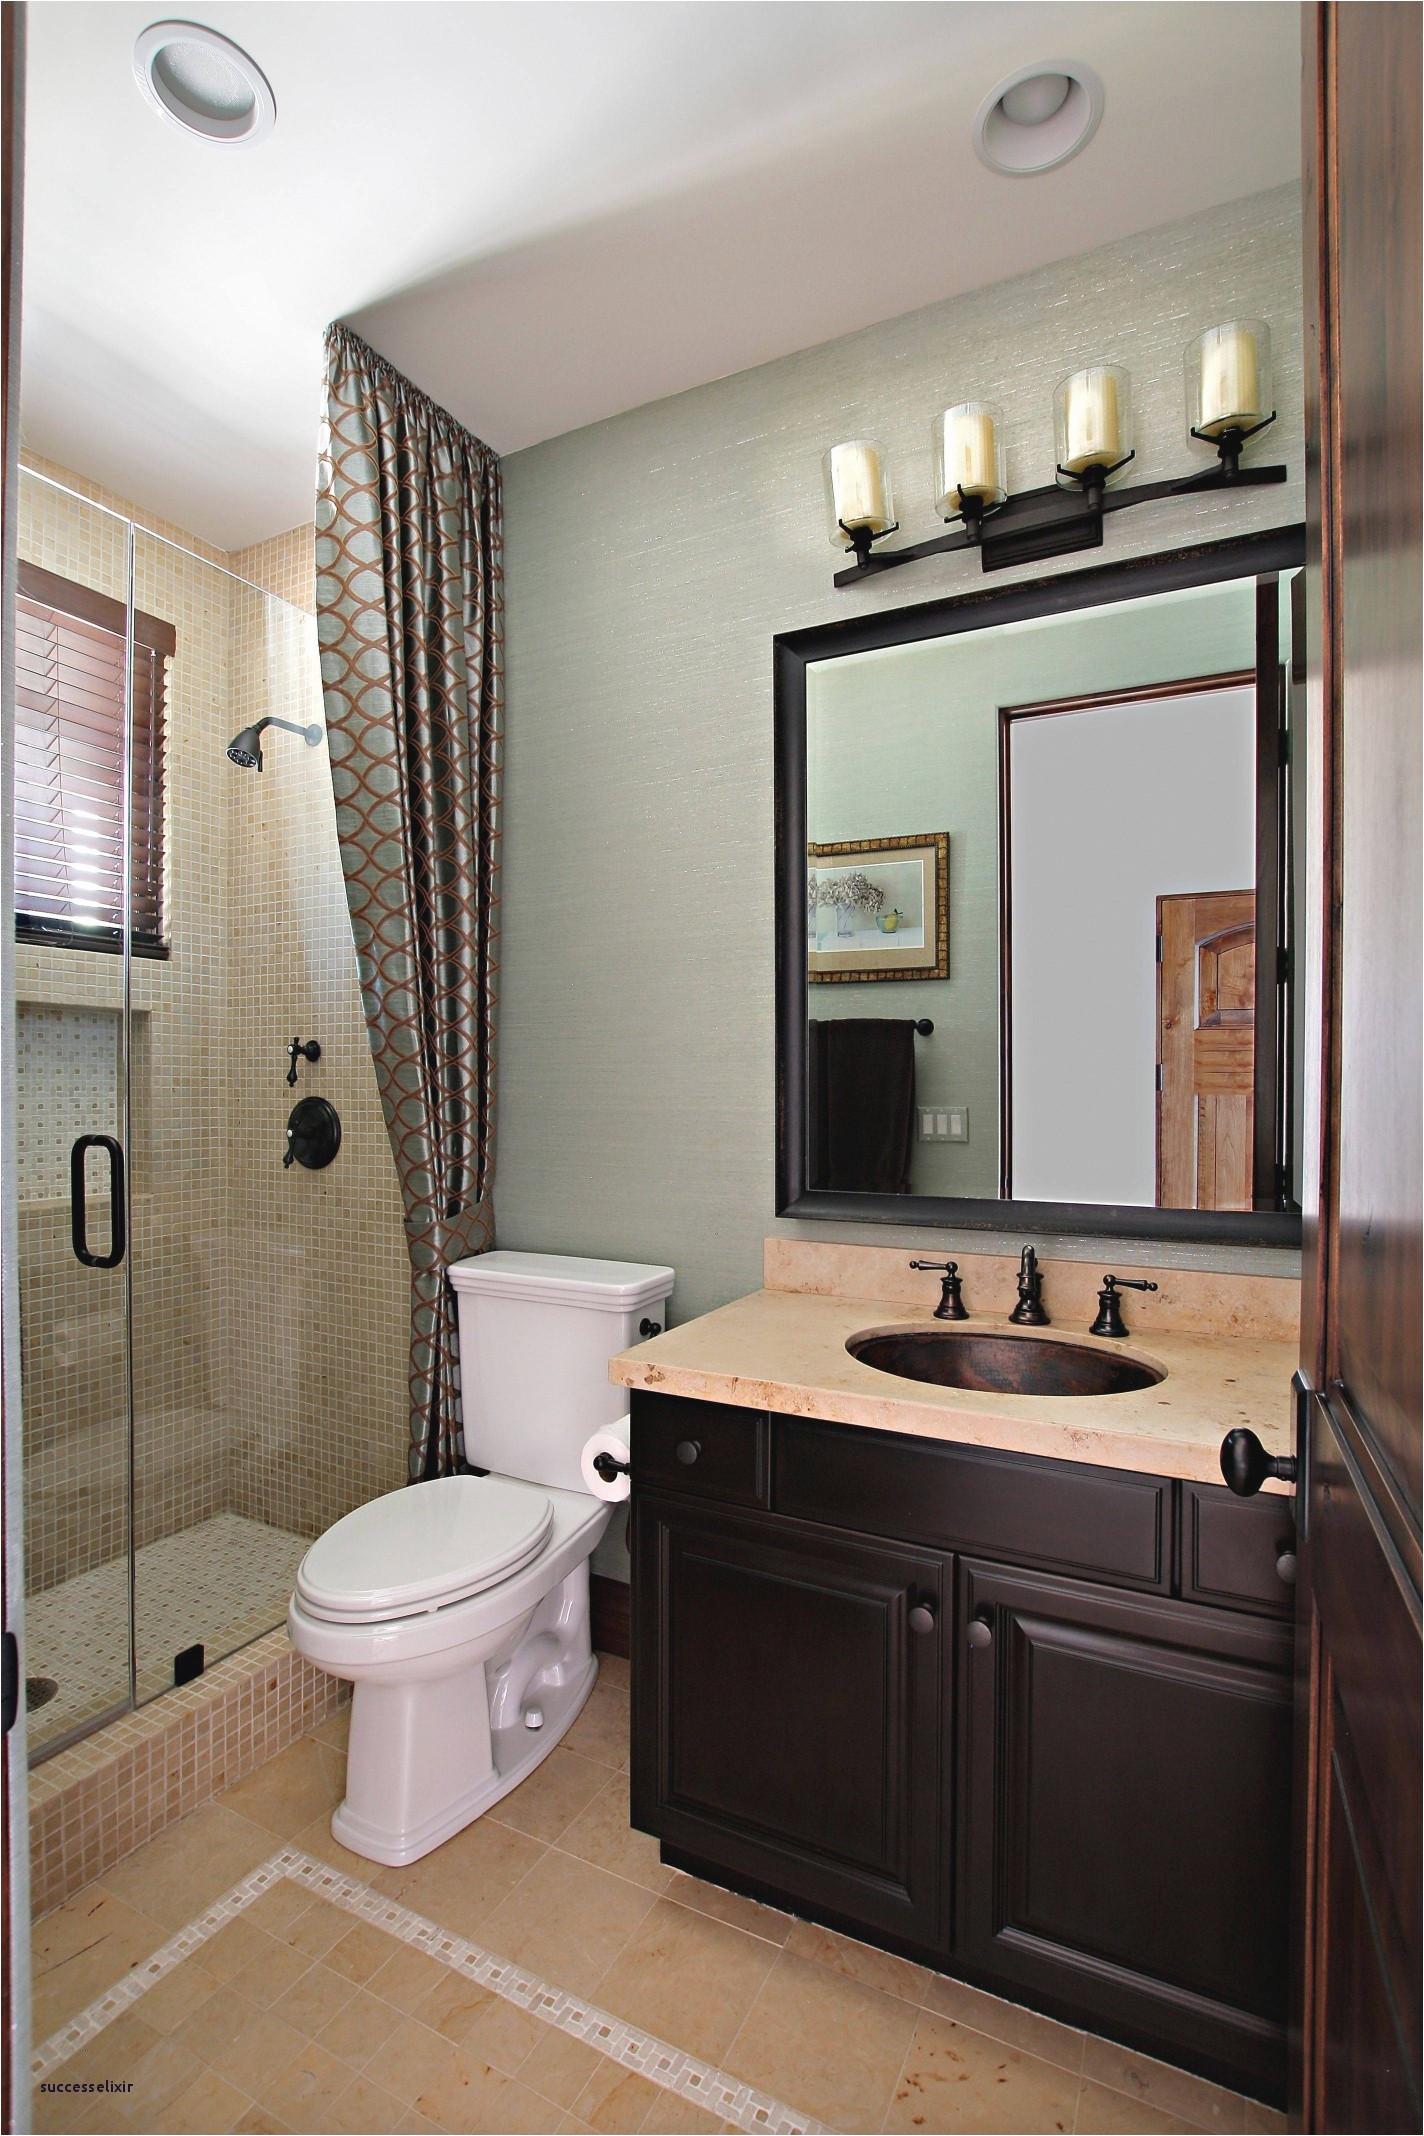 23 design ideas small bathroom space norwin home design